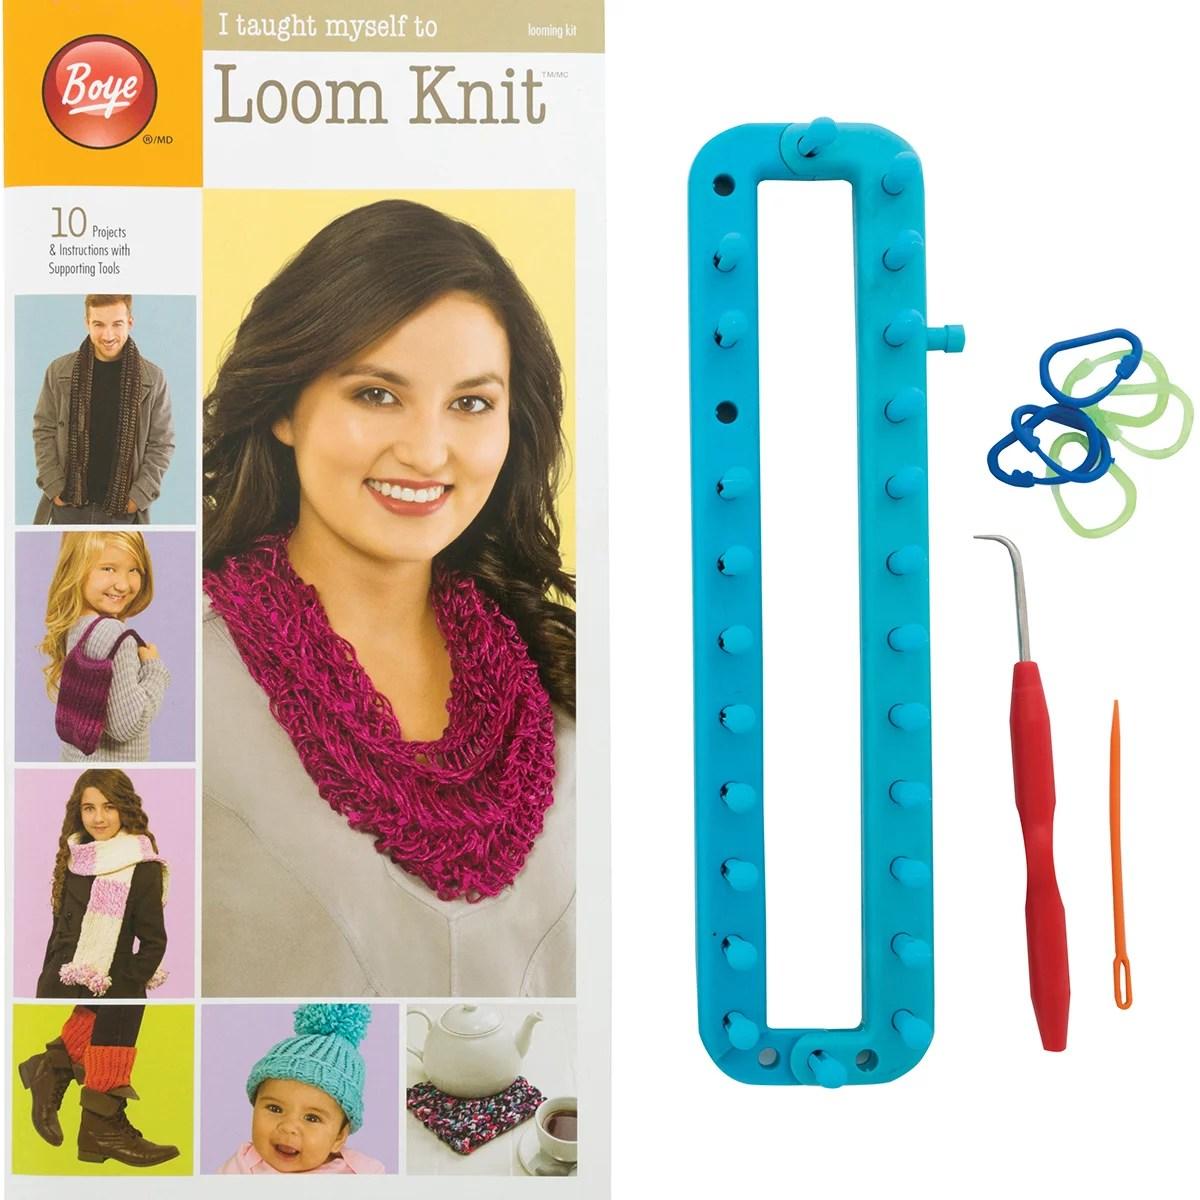 Boye I Taught Myself to Loom Knit Kit, 1 Each